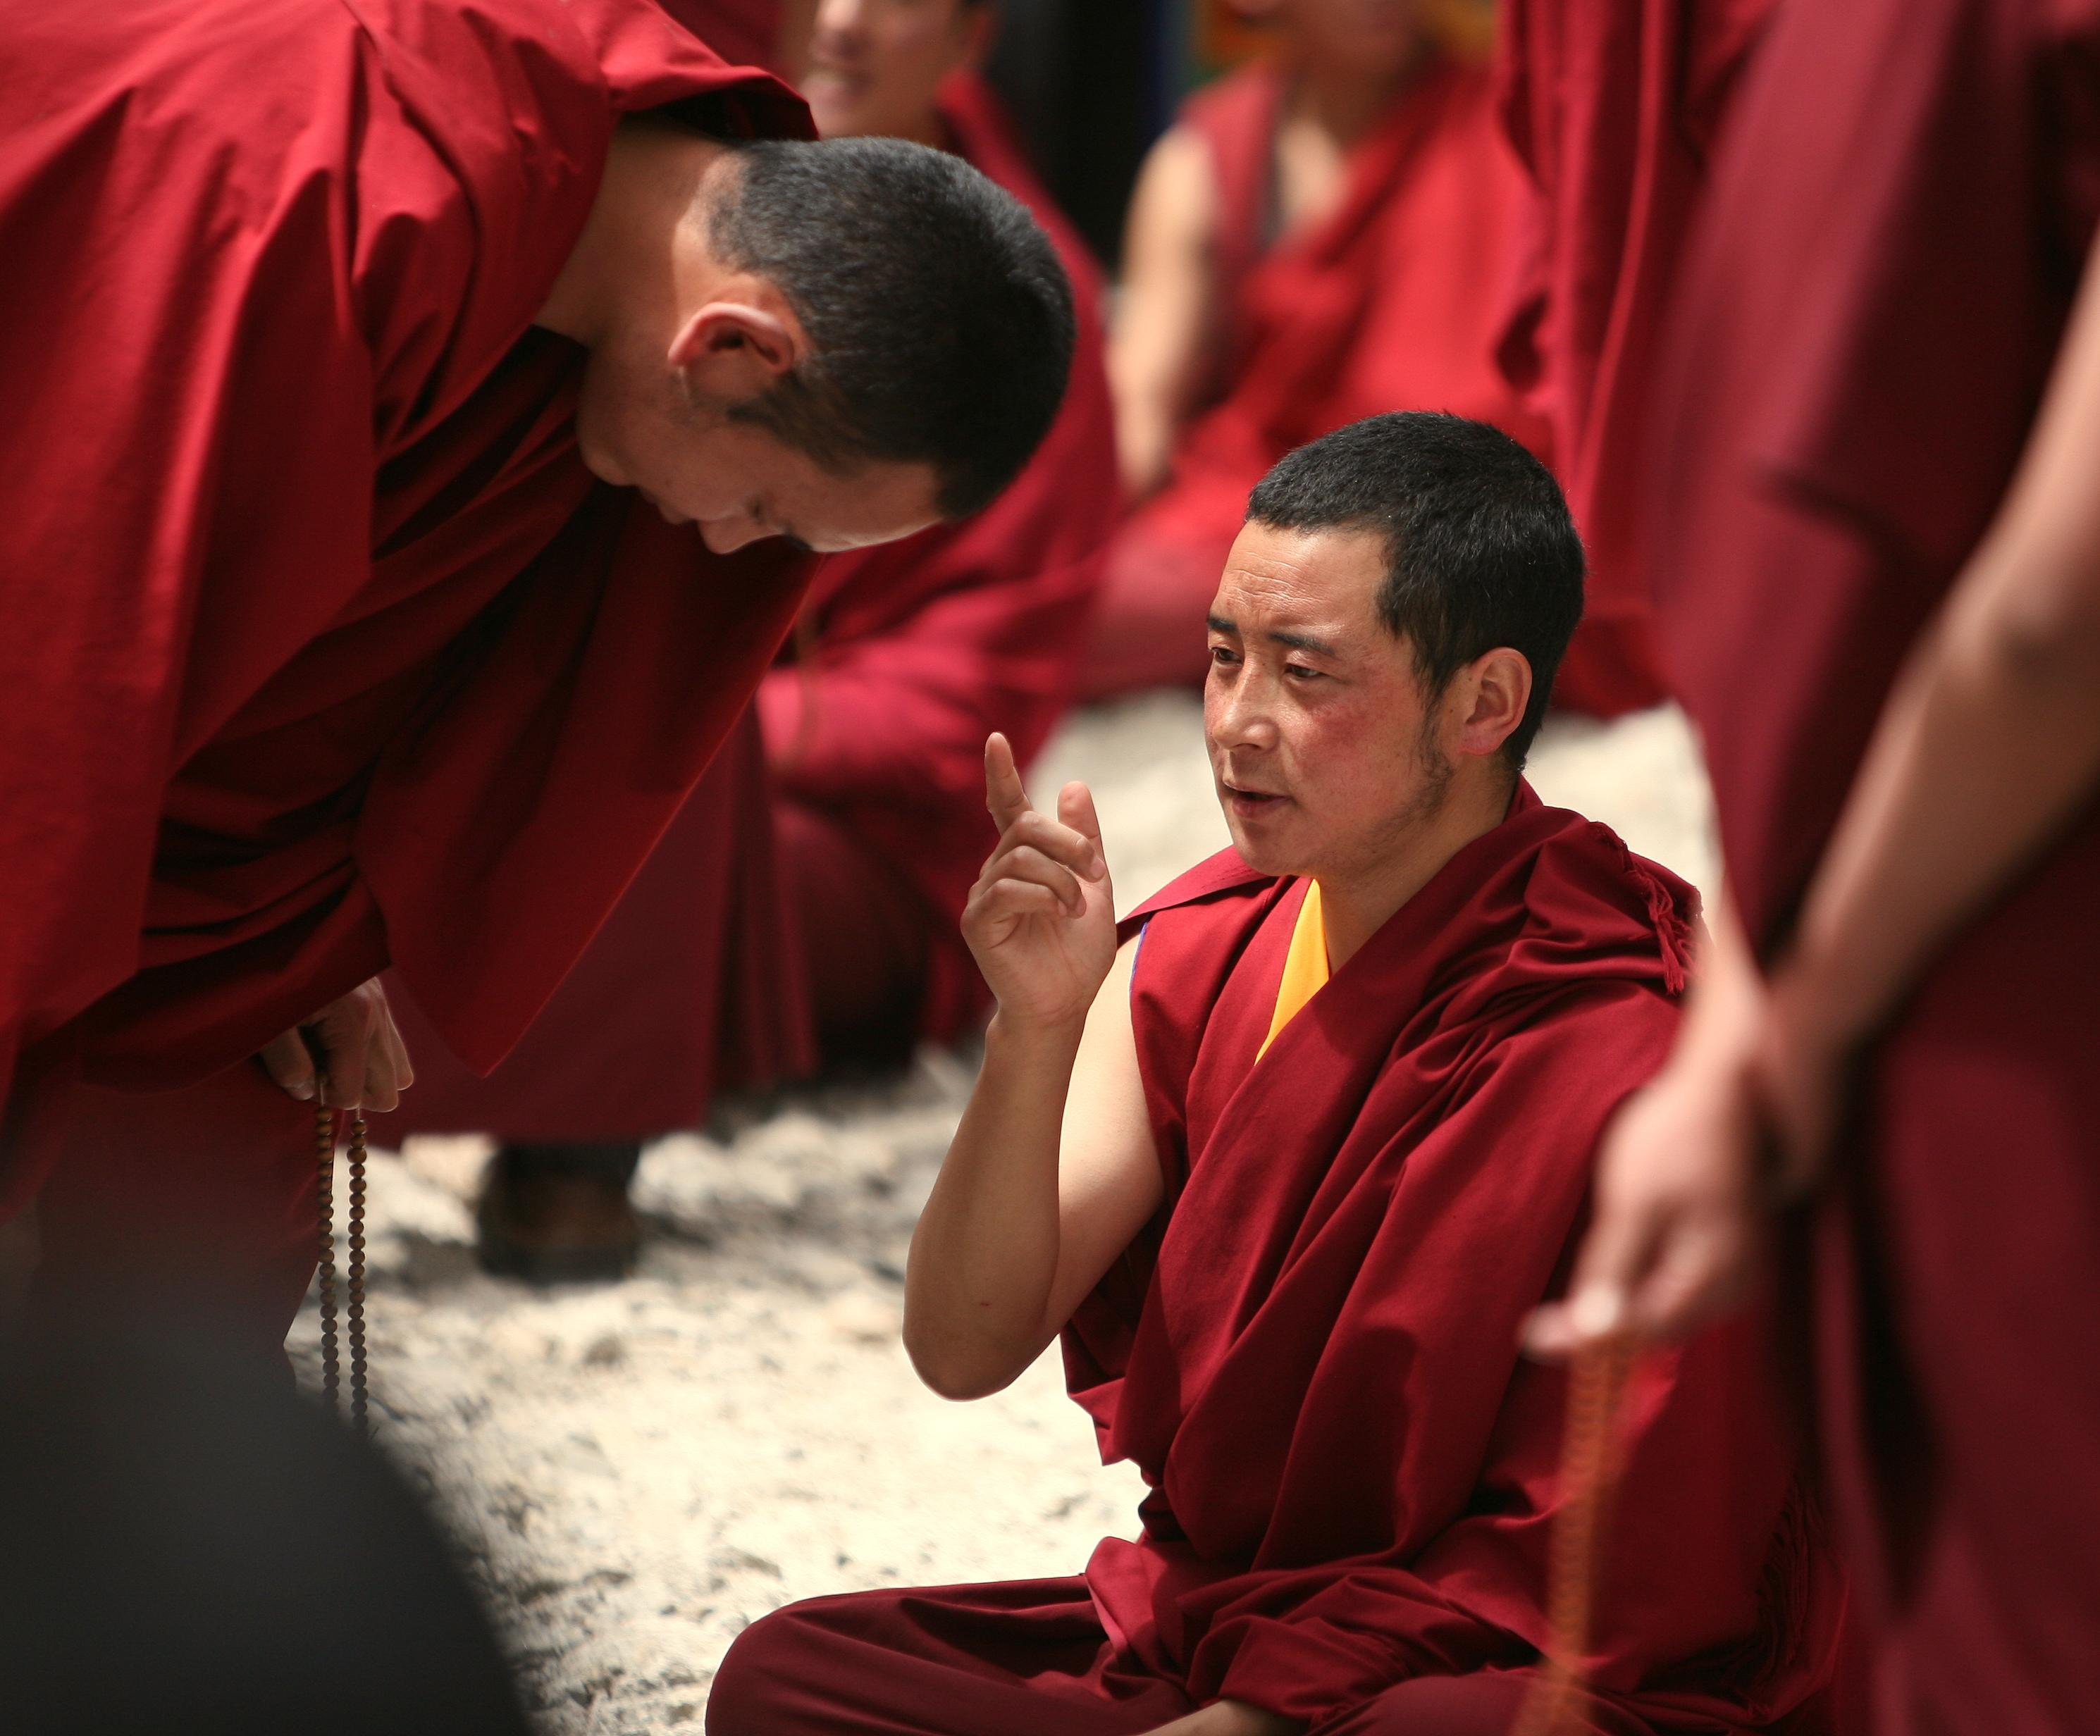 https://upload.wikimedia.org/wikipedia/commons/1/1a/Monks_Debating_Practice_At_Sera_Monastery.JPG